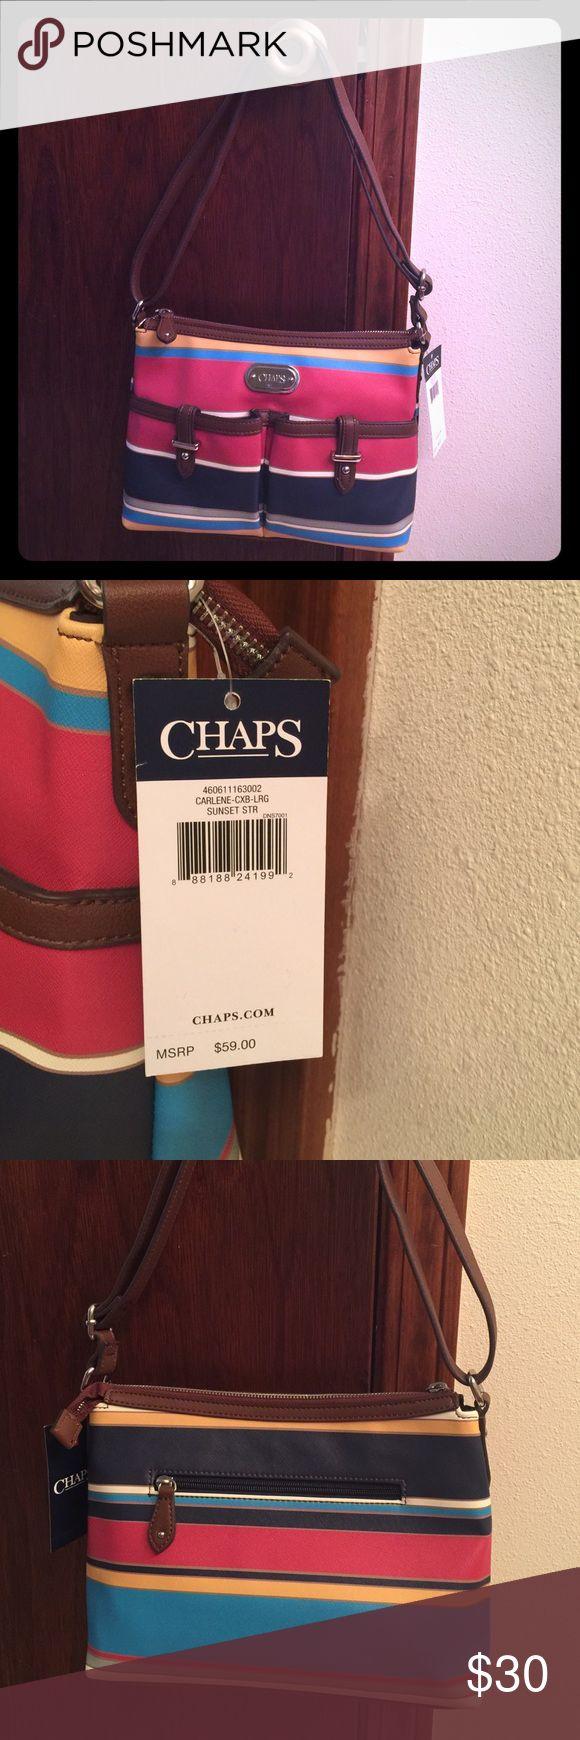 Chaps Ralph Lauren Purse NEW New.  Never used. Still has tags. Ralph Lauren Bags Shoulder Bags